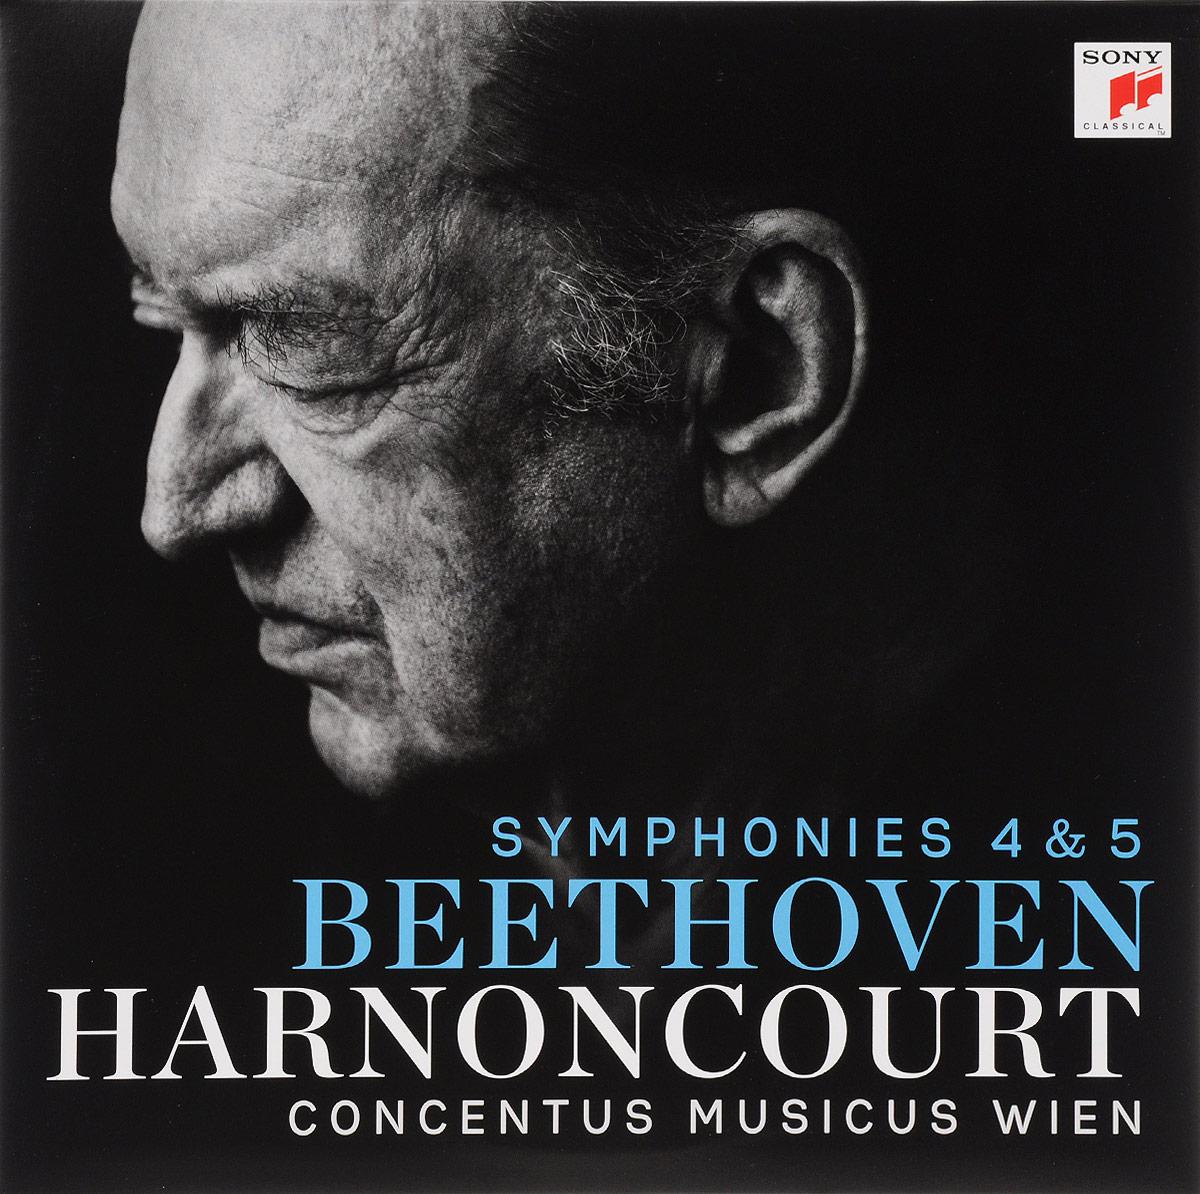 Николаус Арнонкур Beethoven. Symphonies 4 & 5 (2 LP) агхора 2 кундалини 4 издание роберт свобода isbn 978 5 903851 83 6